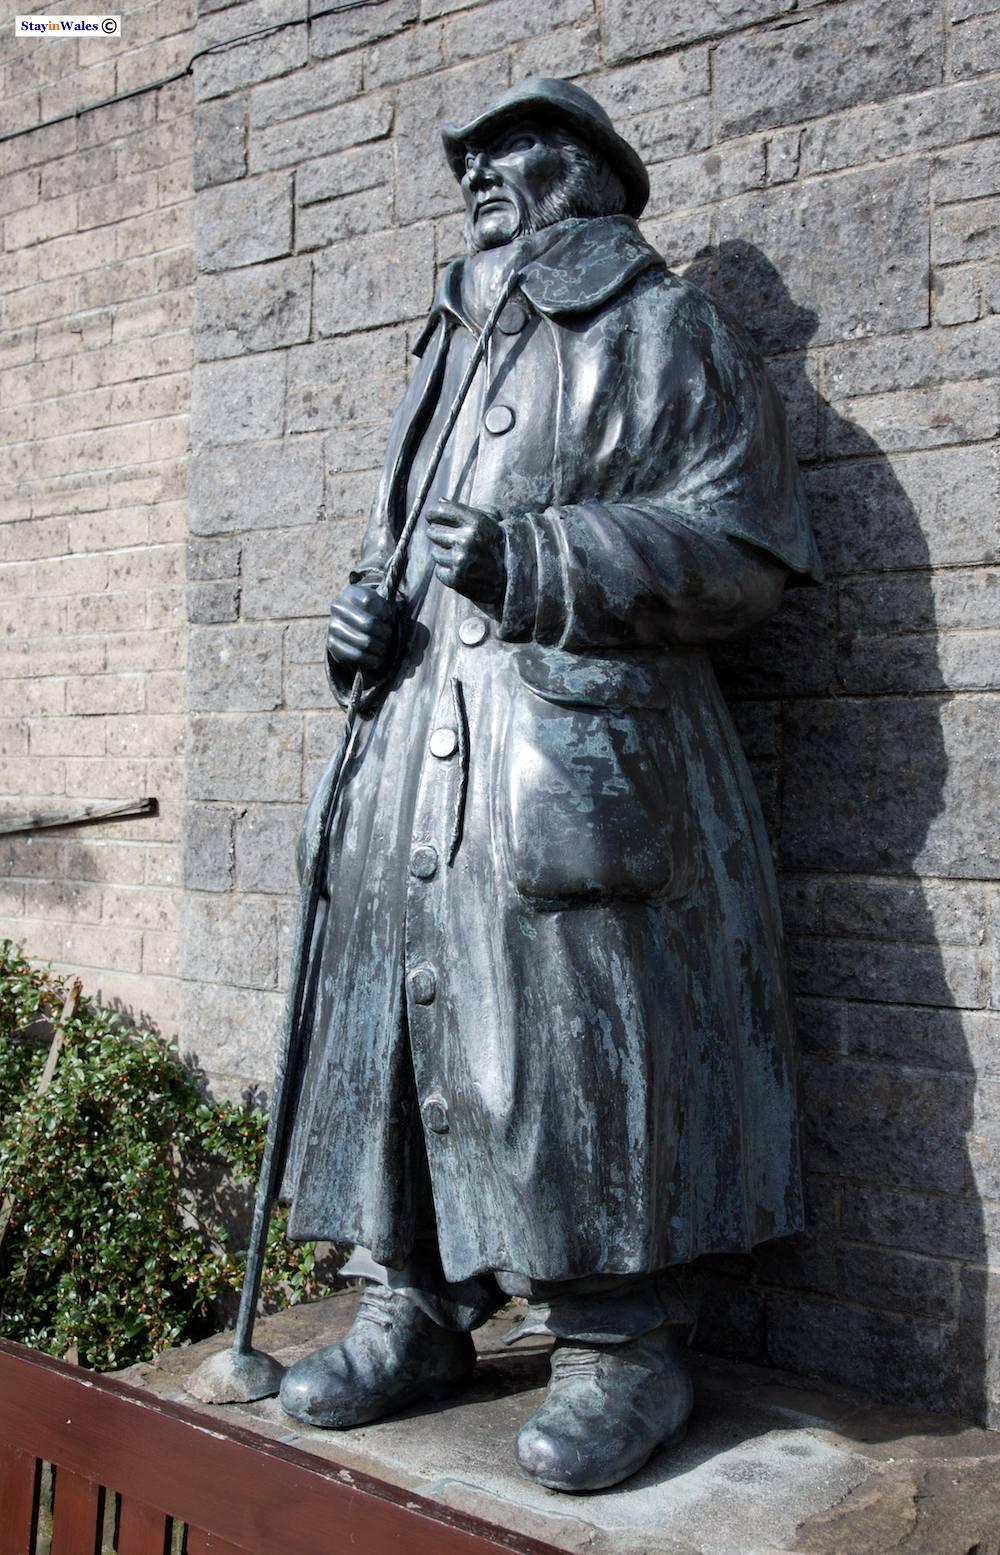 Statue of a drover at Llandovery